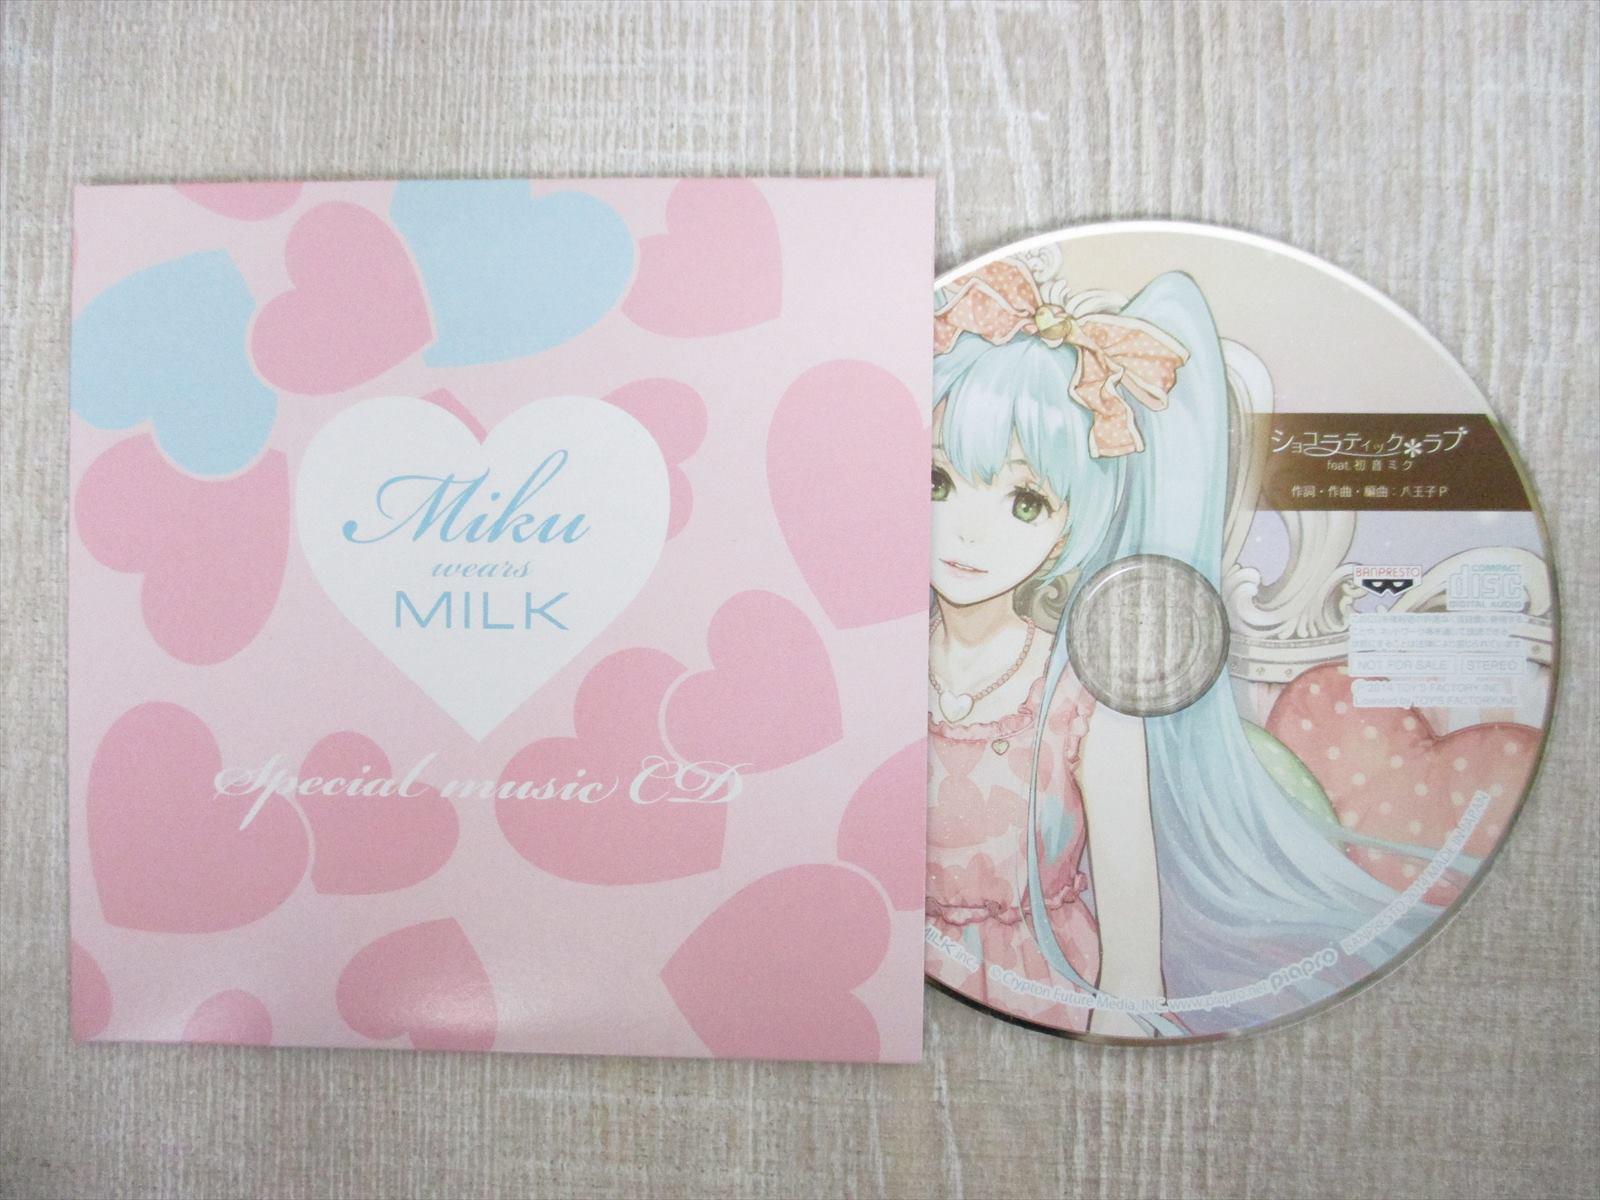 Details about MIKU HATSUNE Wears MILK HEART Art Set wCD Book Lolita 2014 Ltd